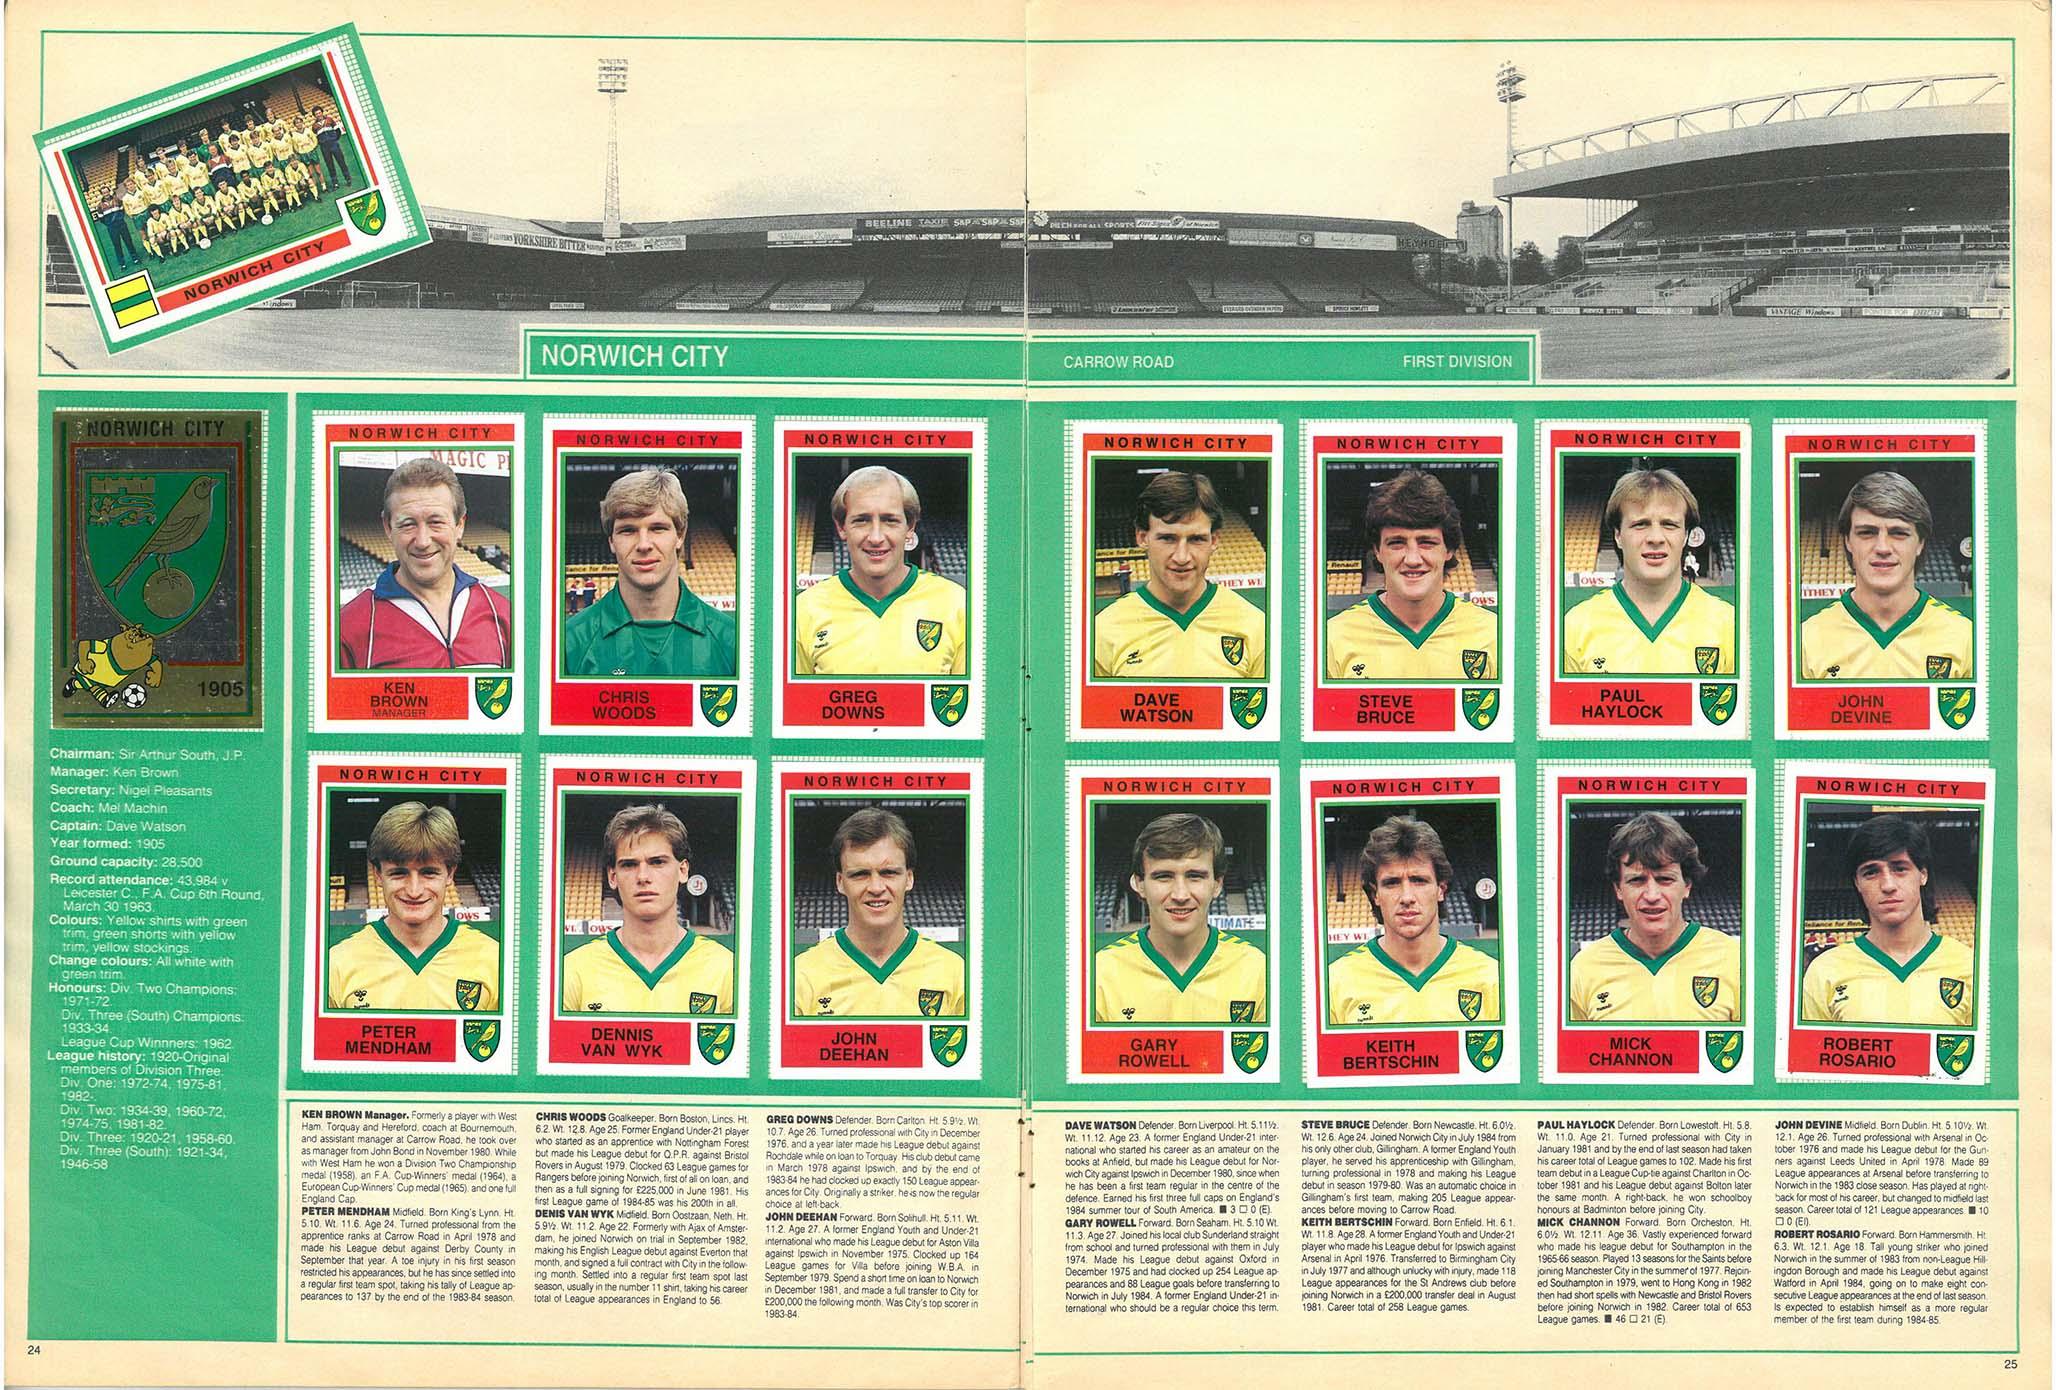 Norwich City 1985